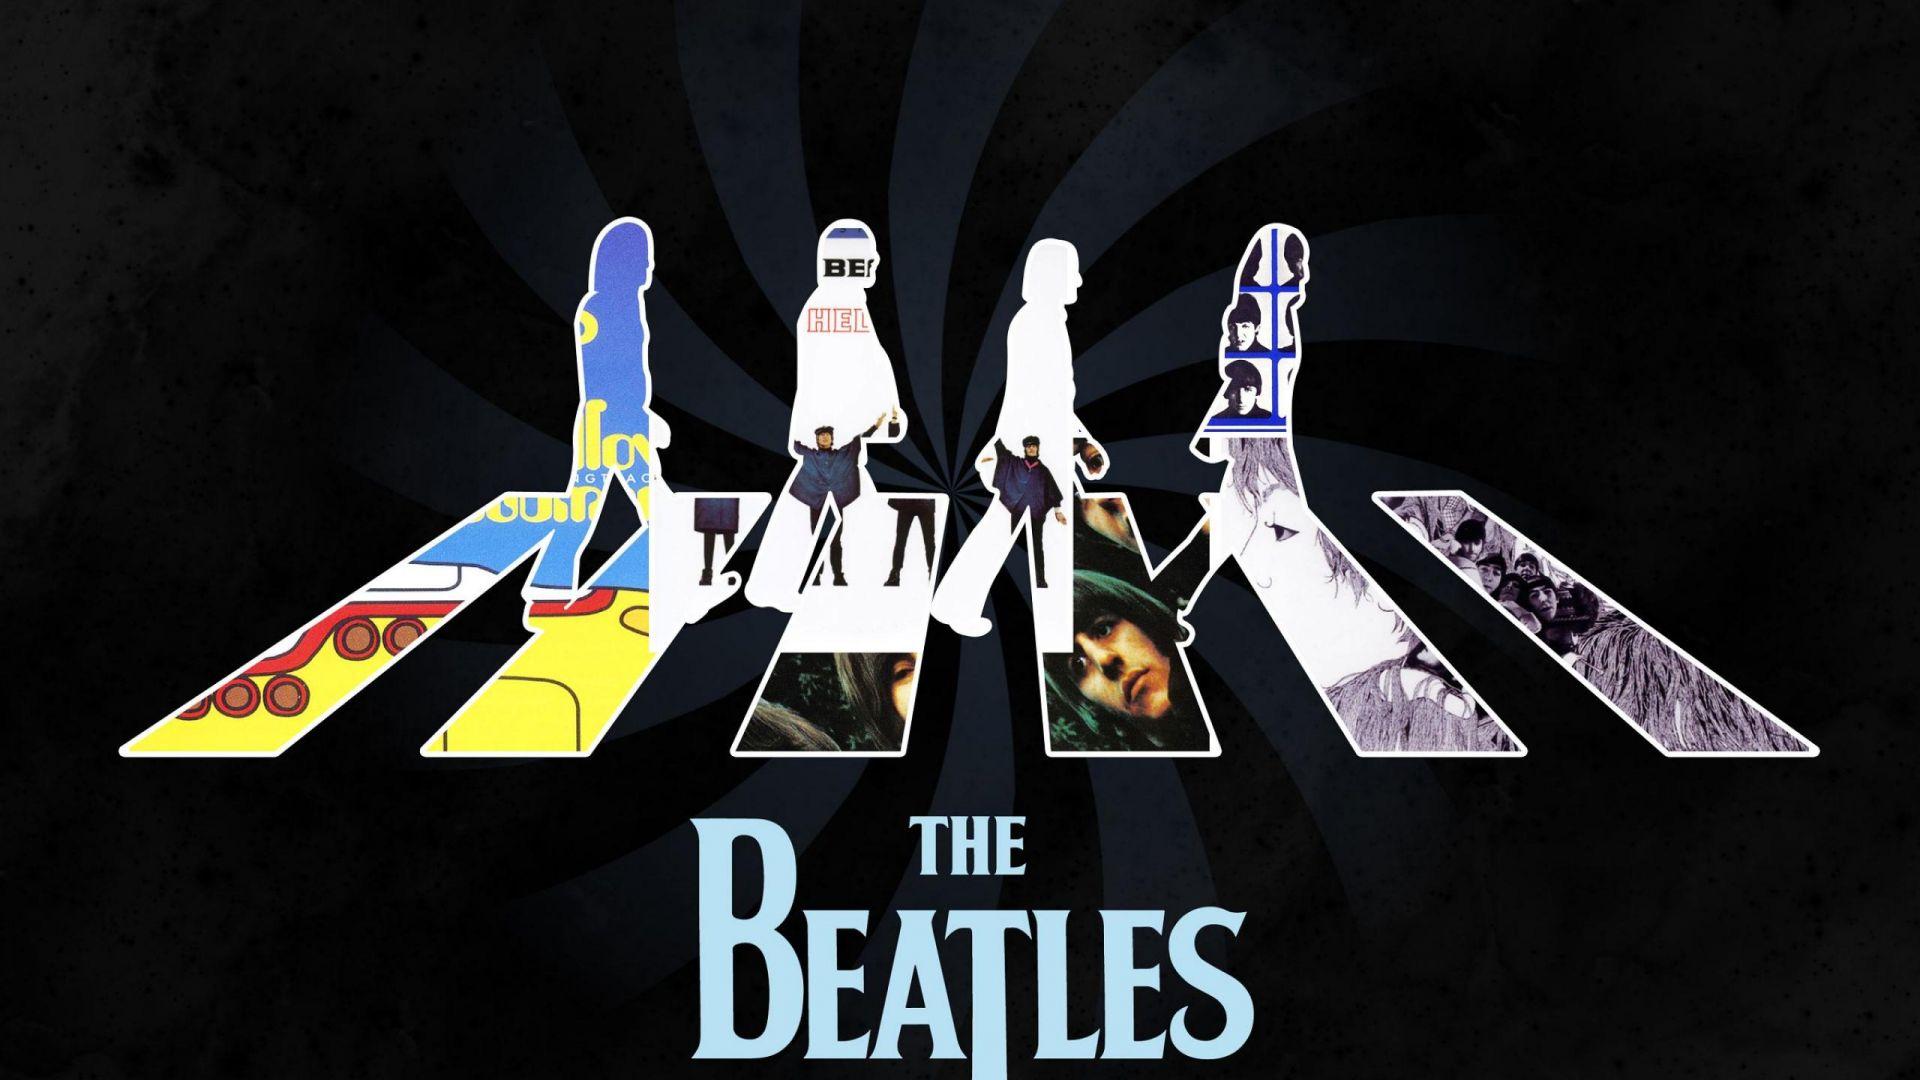 Beatles Iphone Wallpaper Free Beatles Backgrounds Hd Pixelstalk Net